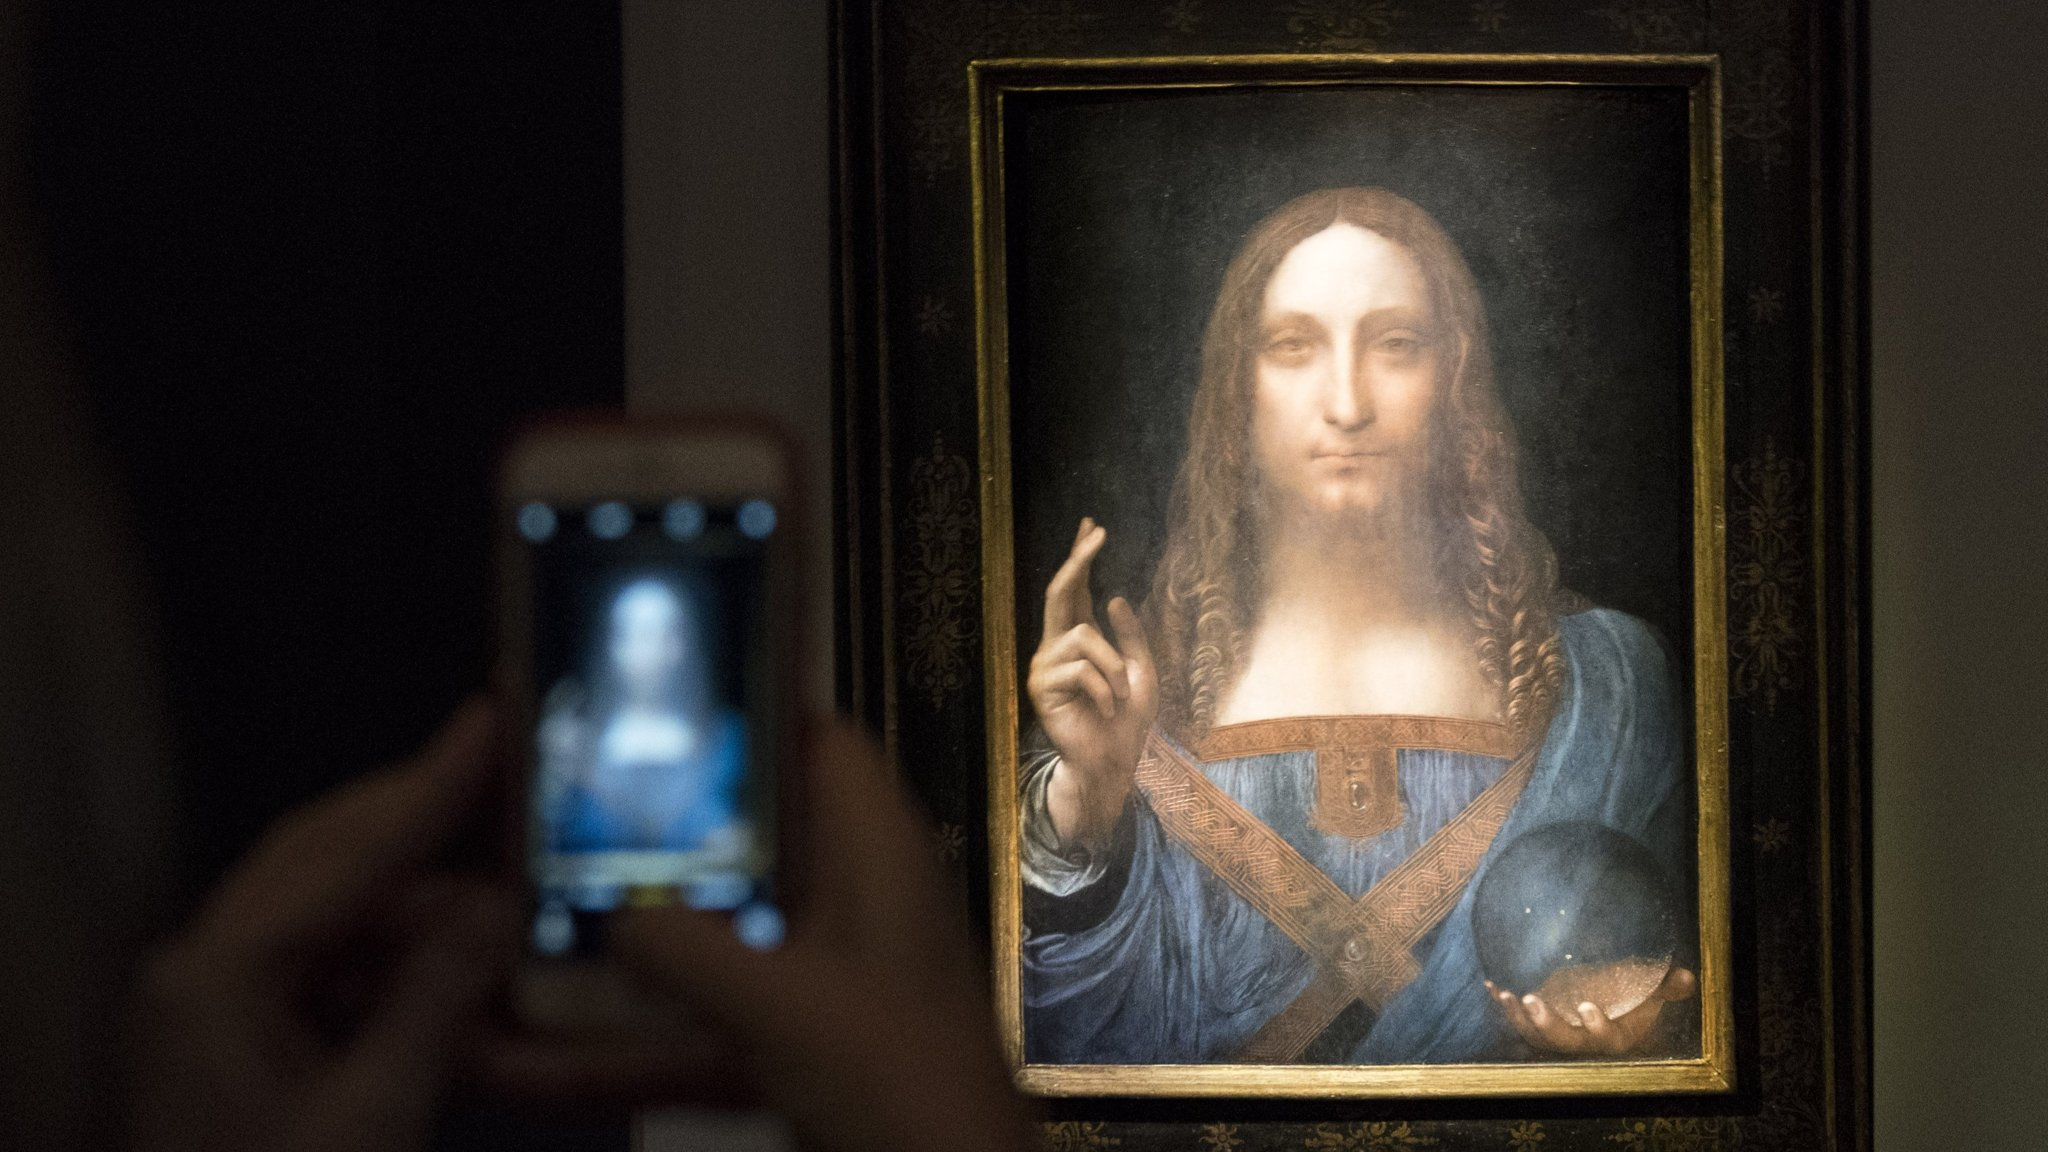 $450m Leonardo painting 'acquired' for Louvre Abu Dhabi